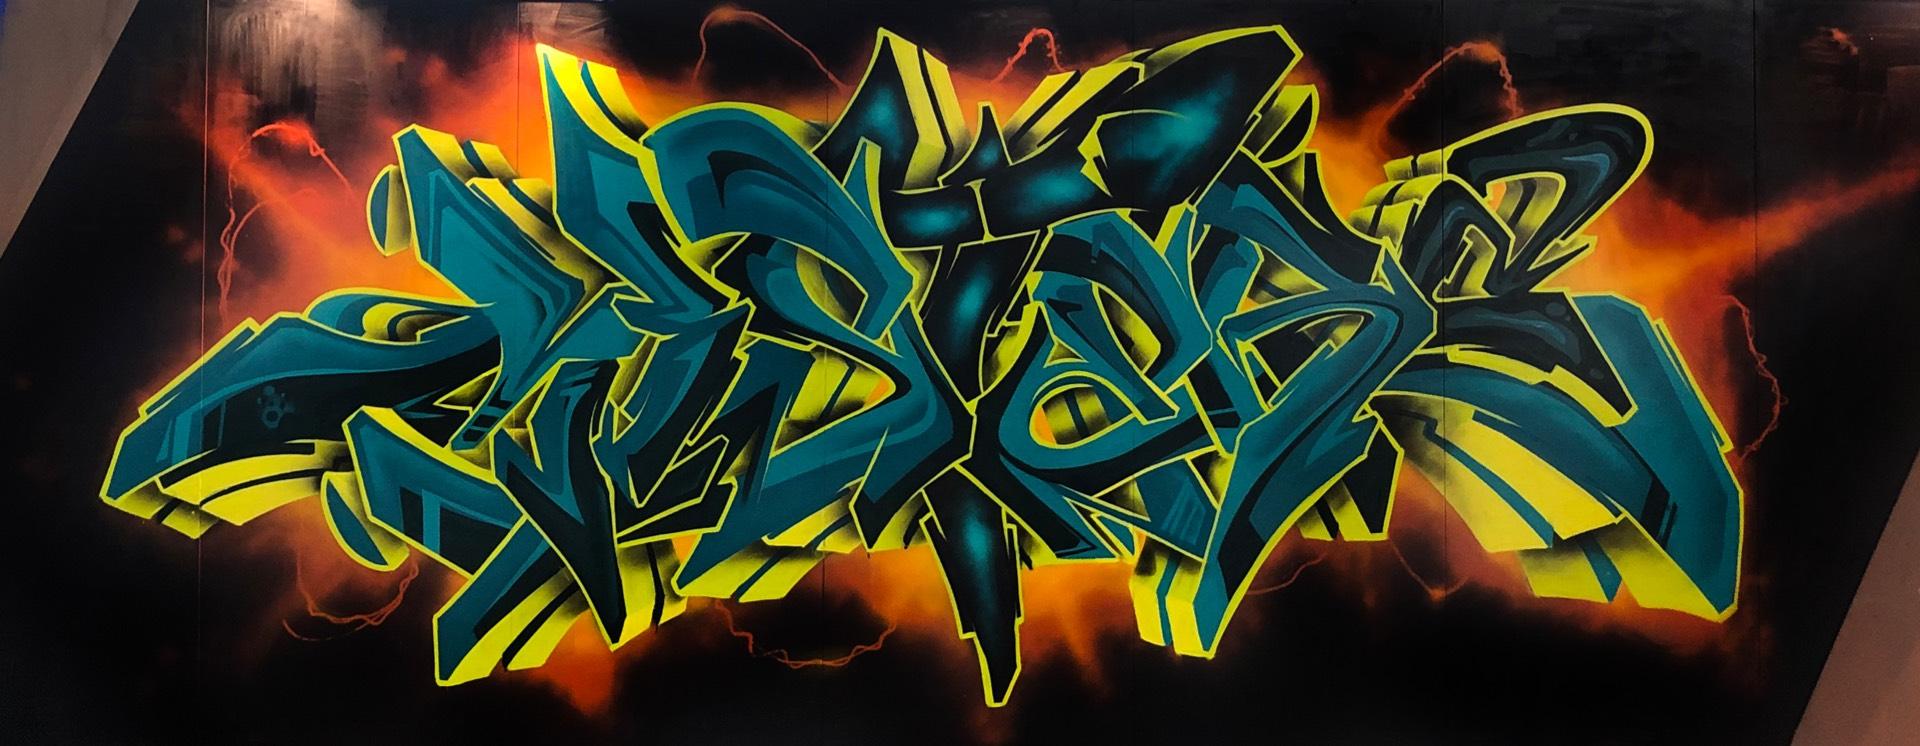 Mister Acker wildstyle graffiti Palermo